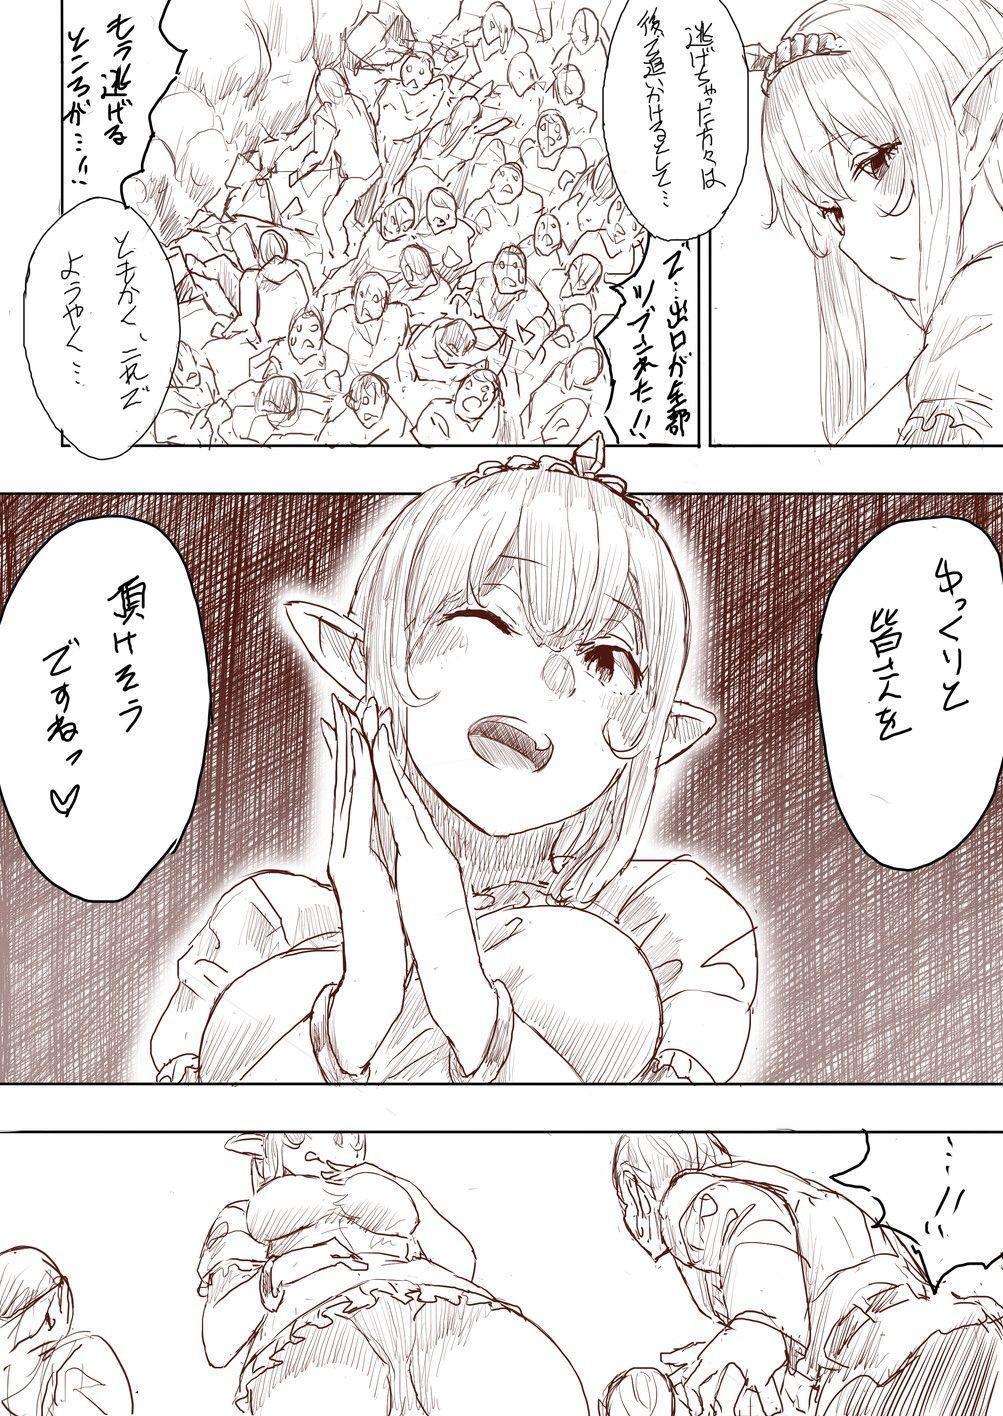 Elf Princess Strikes Back 121